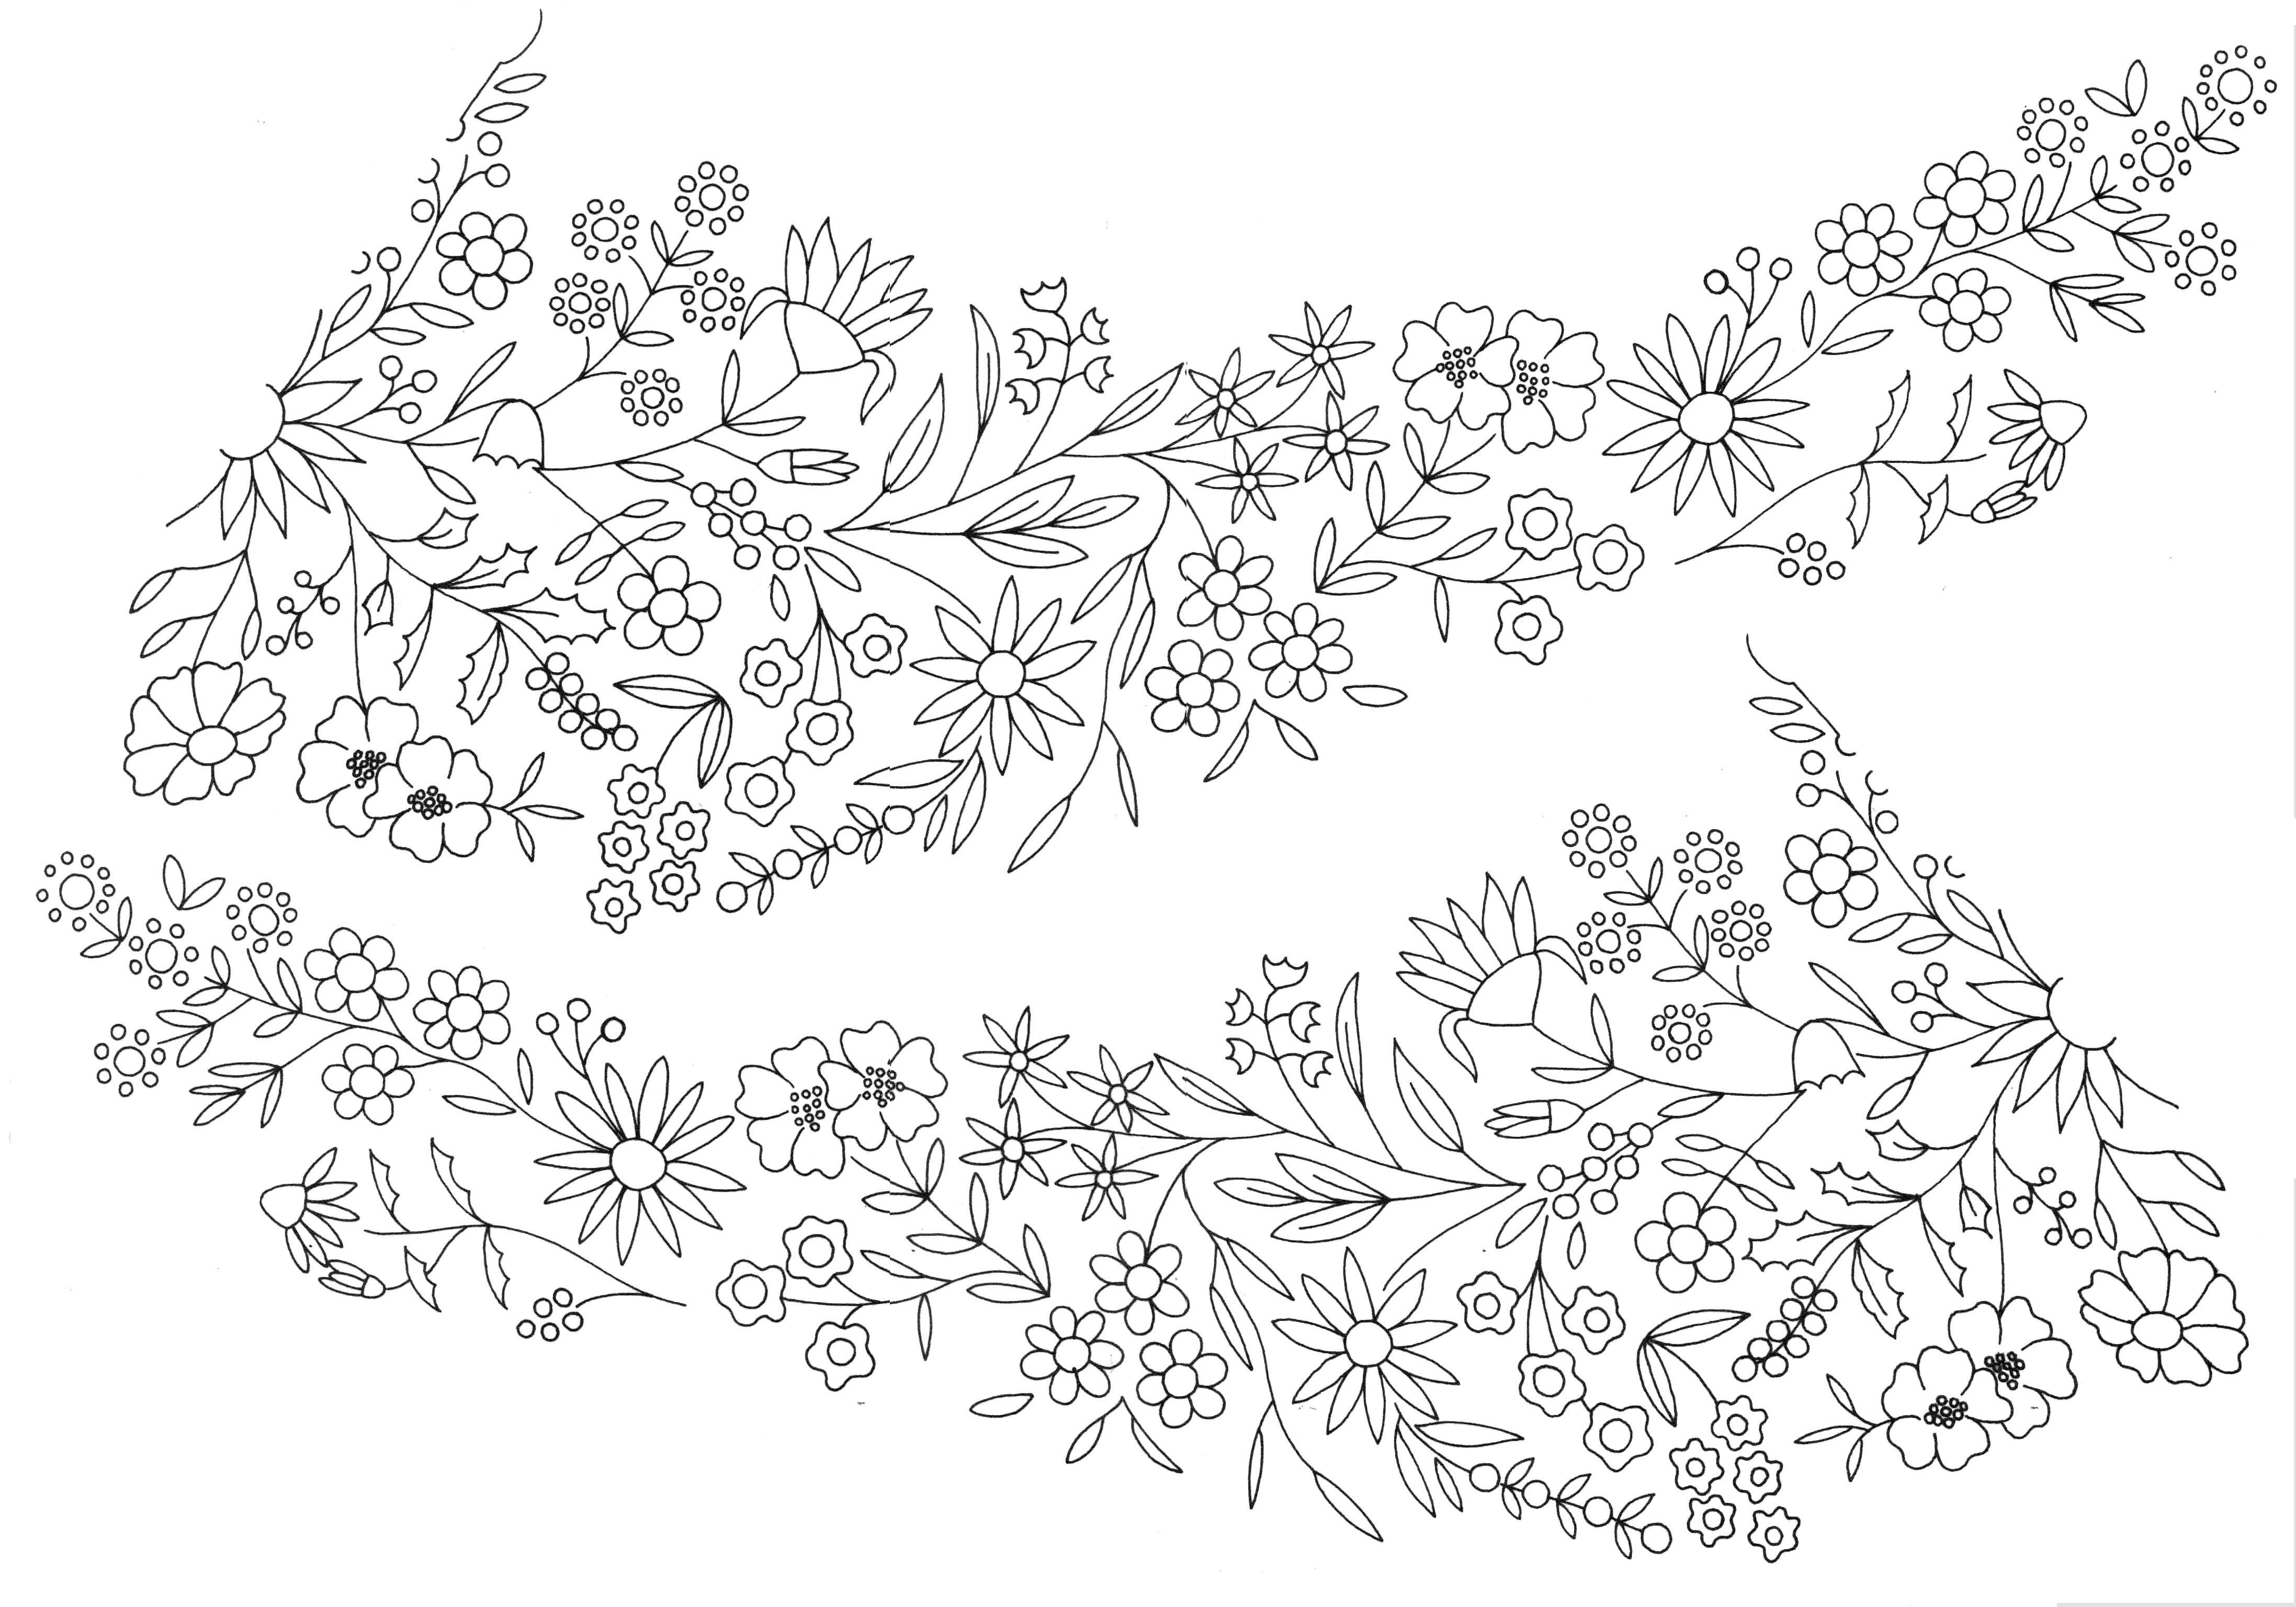 Embroidery Pattern | Em pattern | Pinterest | Bordado, Puntadas y Dibujo